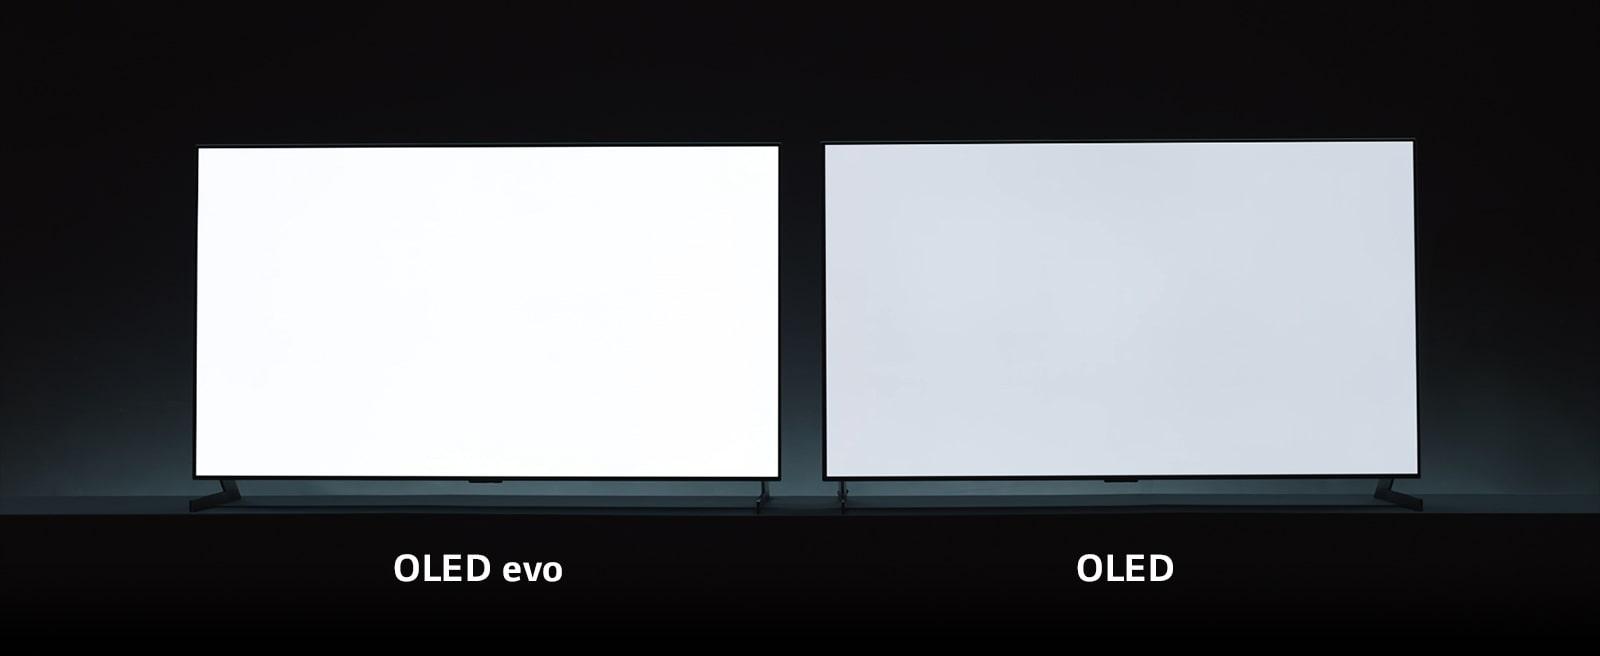 LG OLED evo Standar Baru Teknologi Layar Self-Lit Pixels